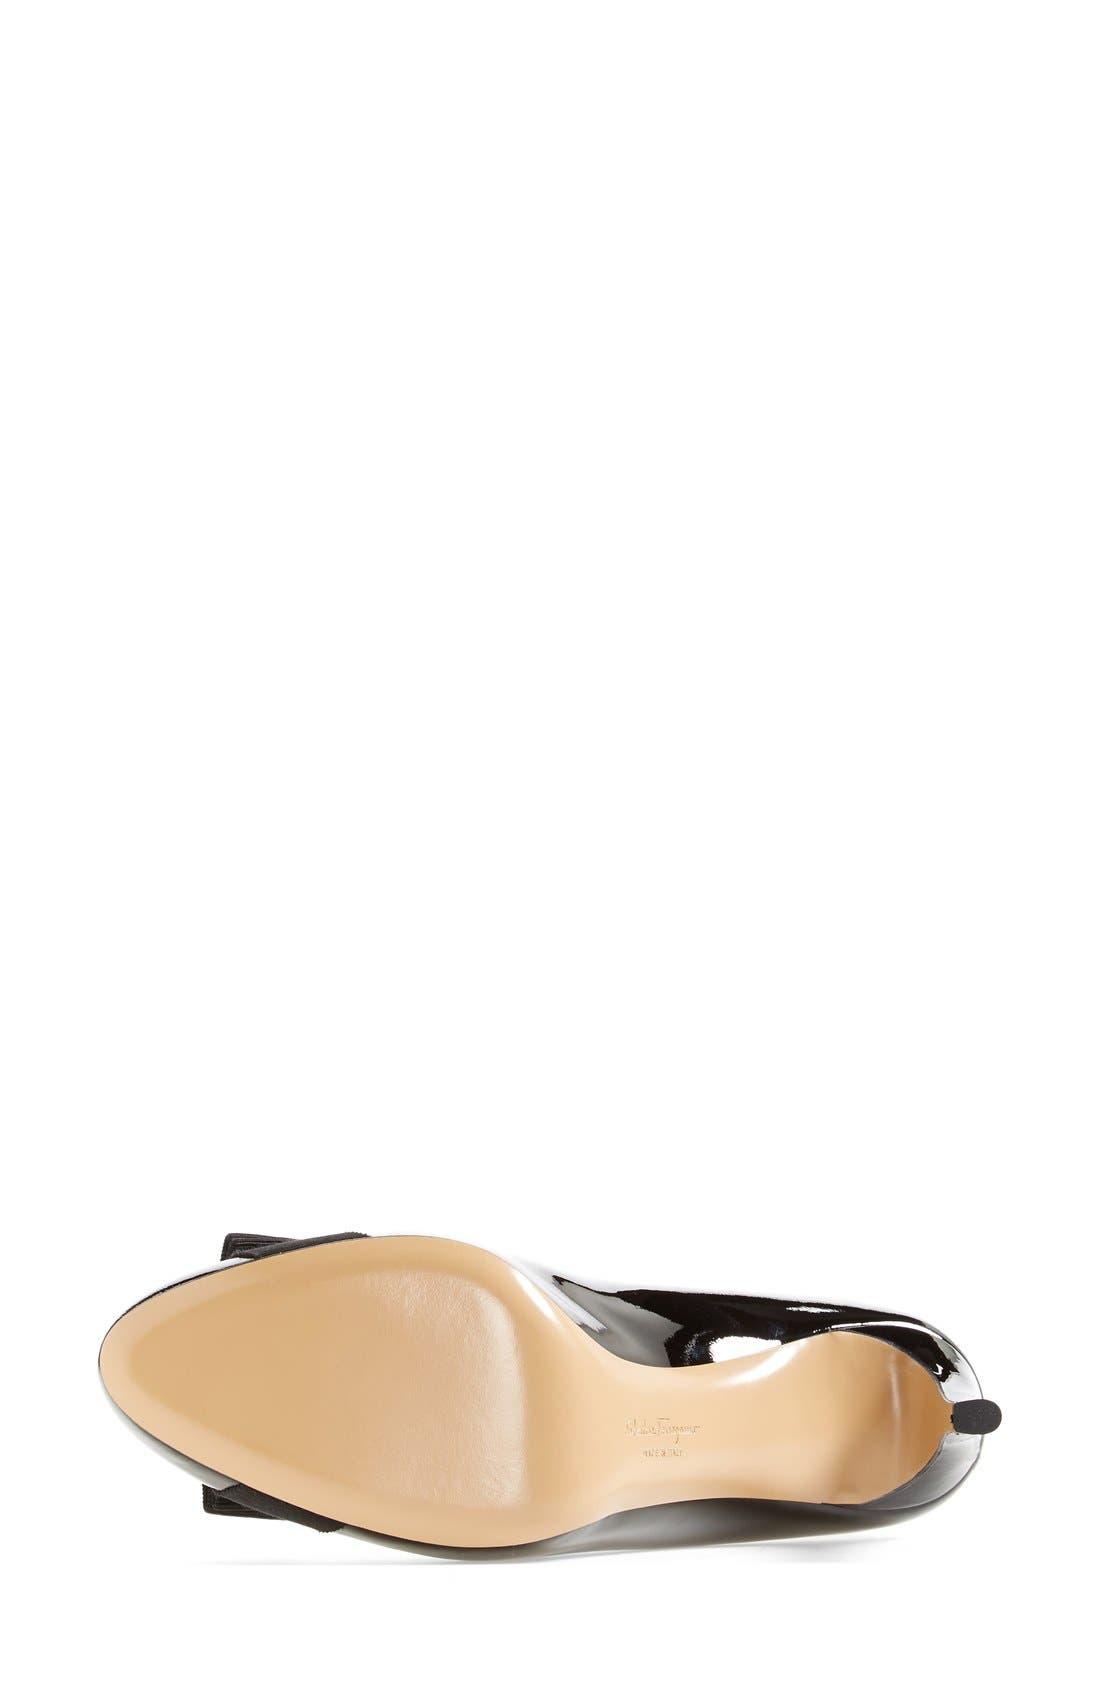 Pimpa Rounded Toe Bow Pump,                             Alternate thumbnail 6, color,